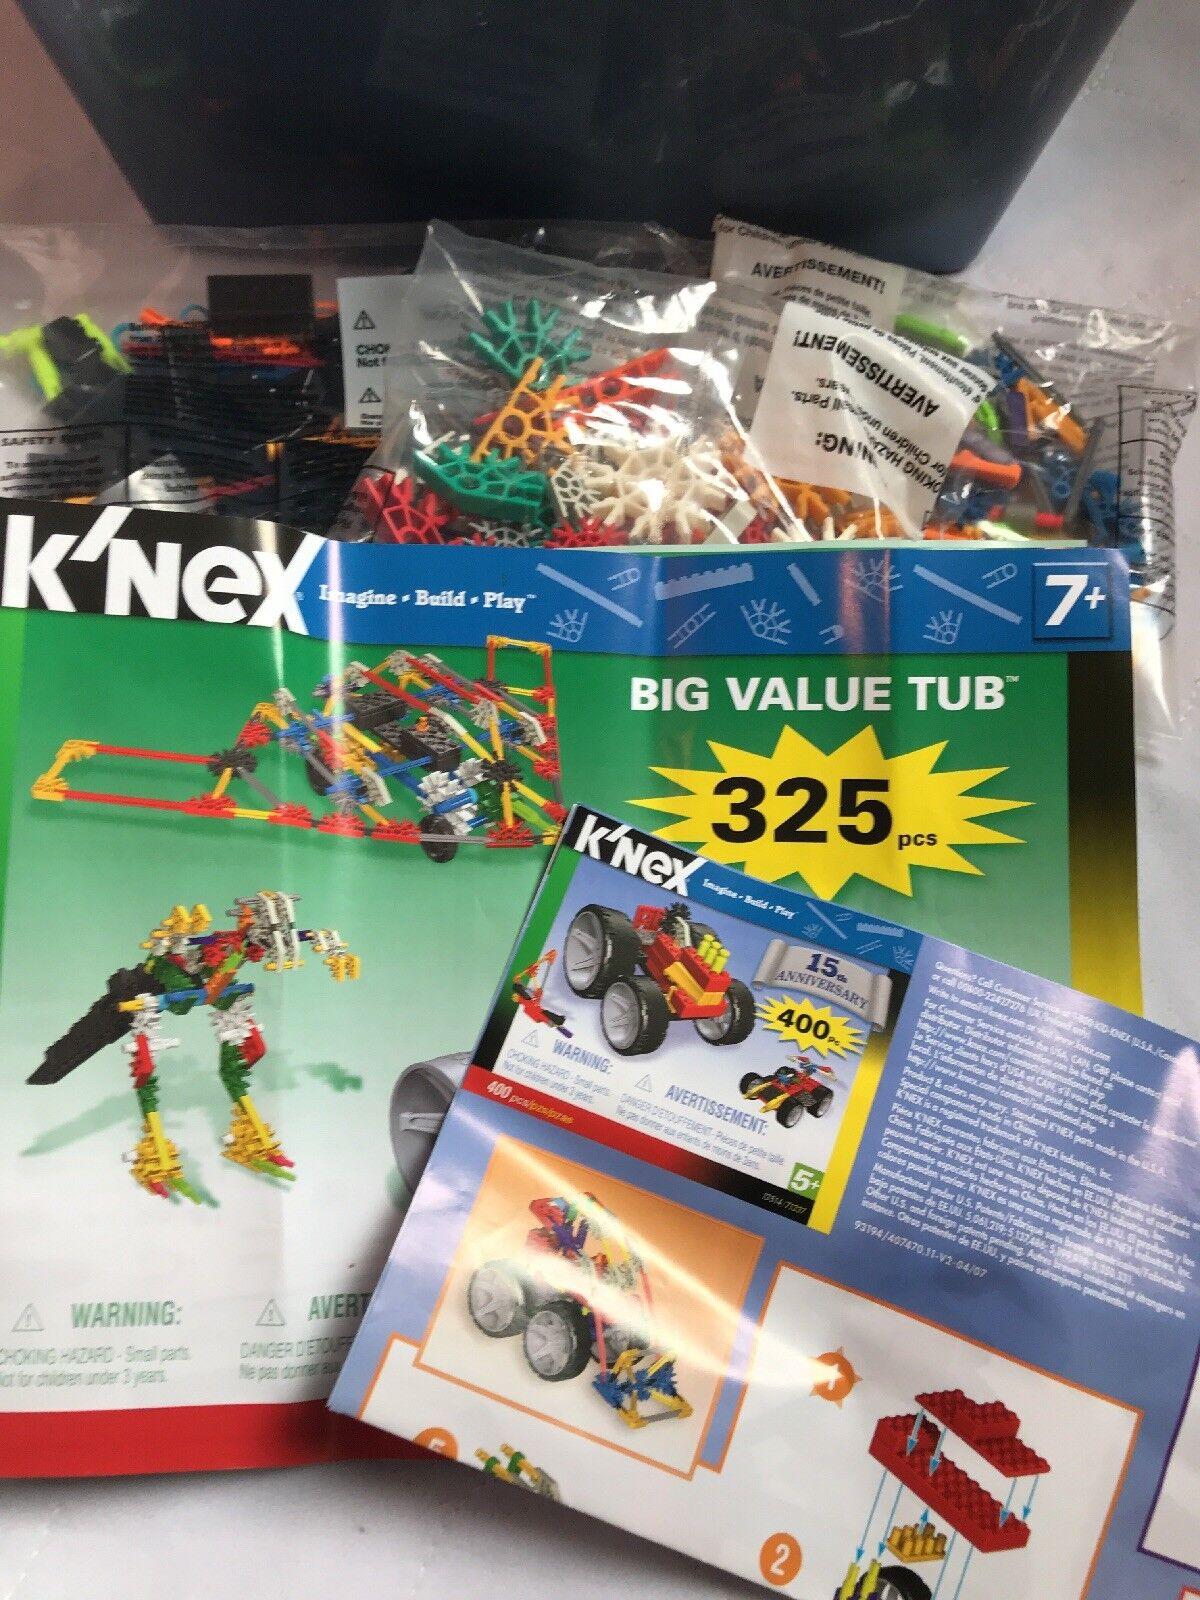 K'nex 15th Anniversary 400 Pcs educational building set, lots of models